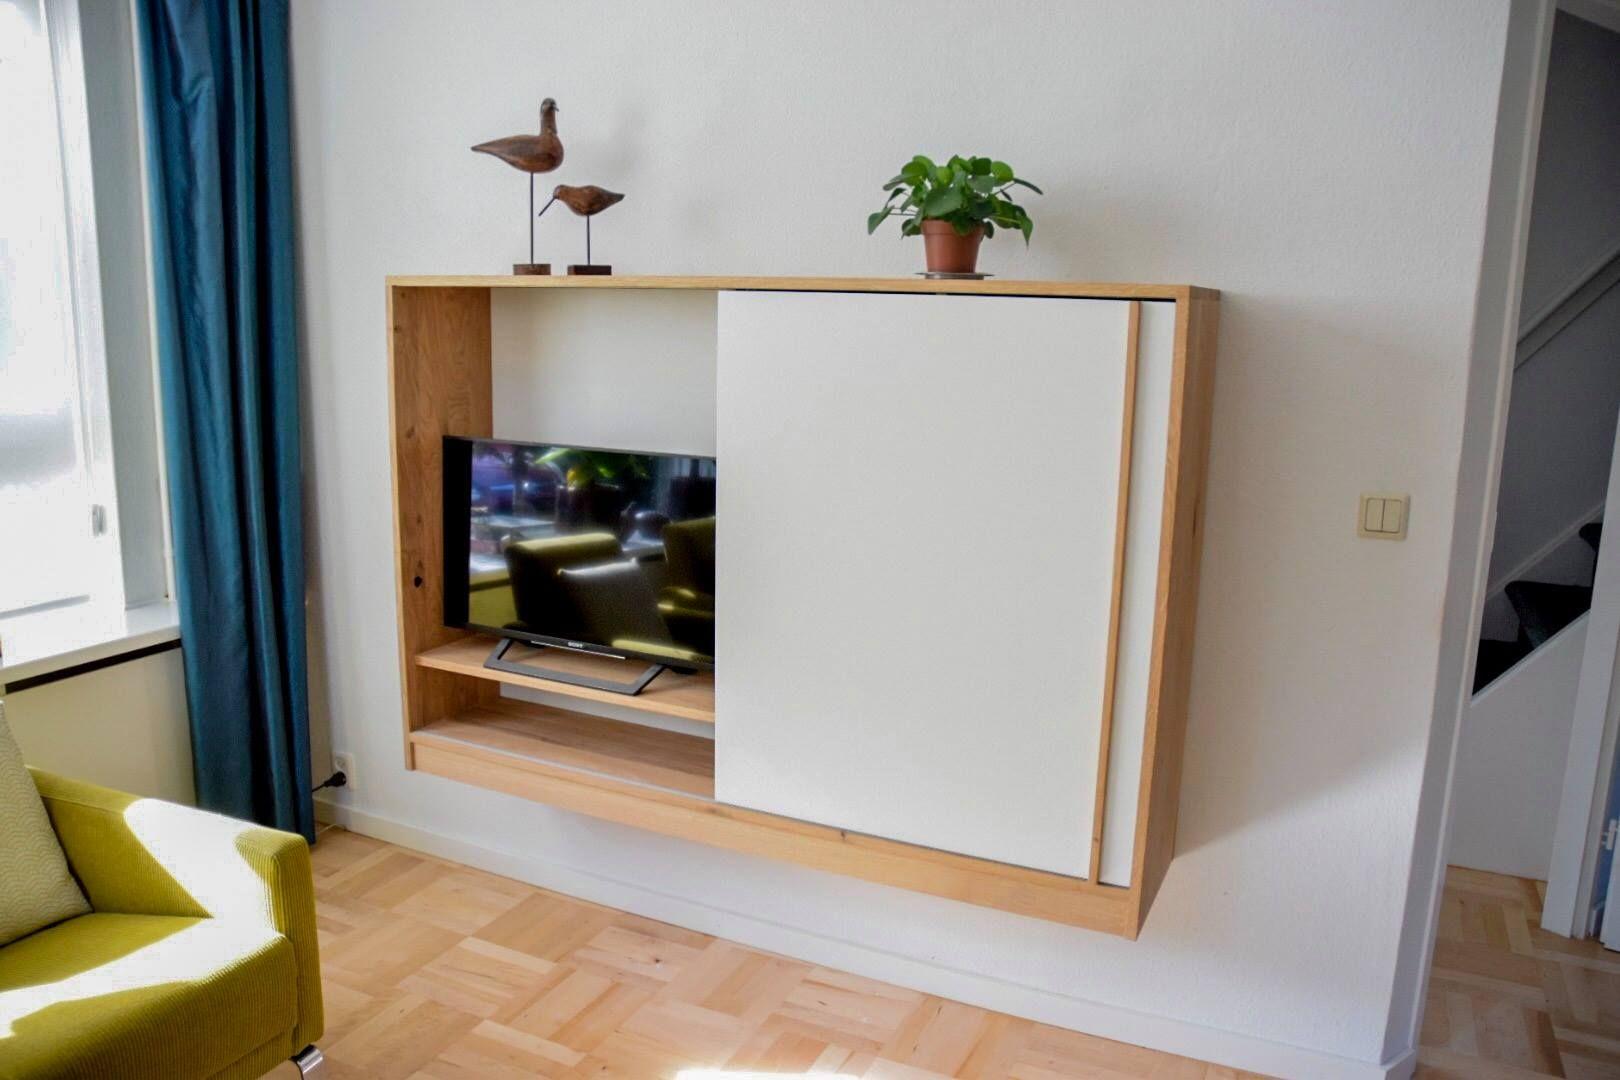 Design Kast Woonkamer : Tv kast #woonkamer #woonkamerdesign #designkast #furniturestyling